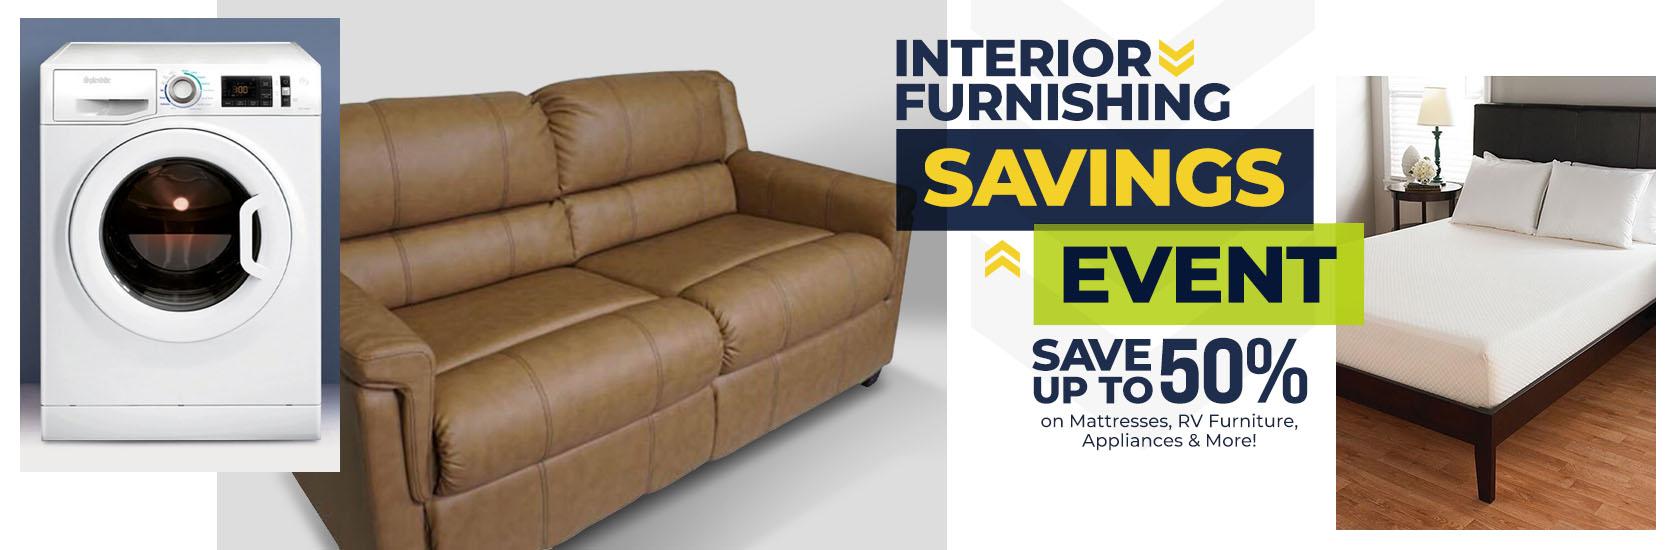 Interior Furnishings Savings Event